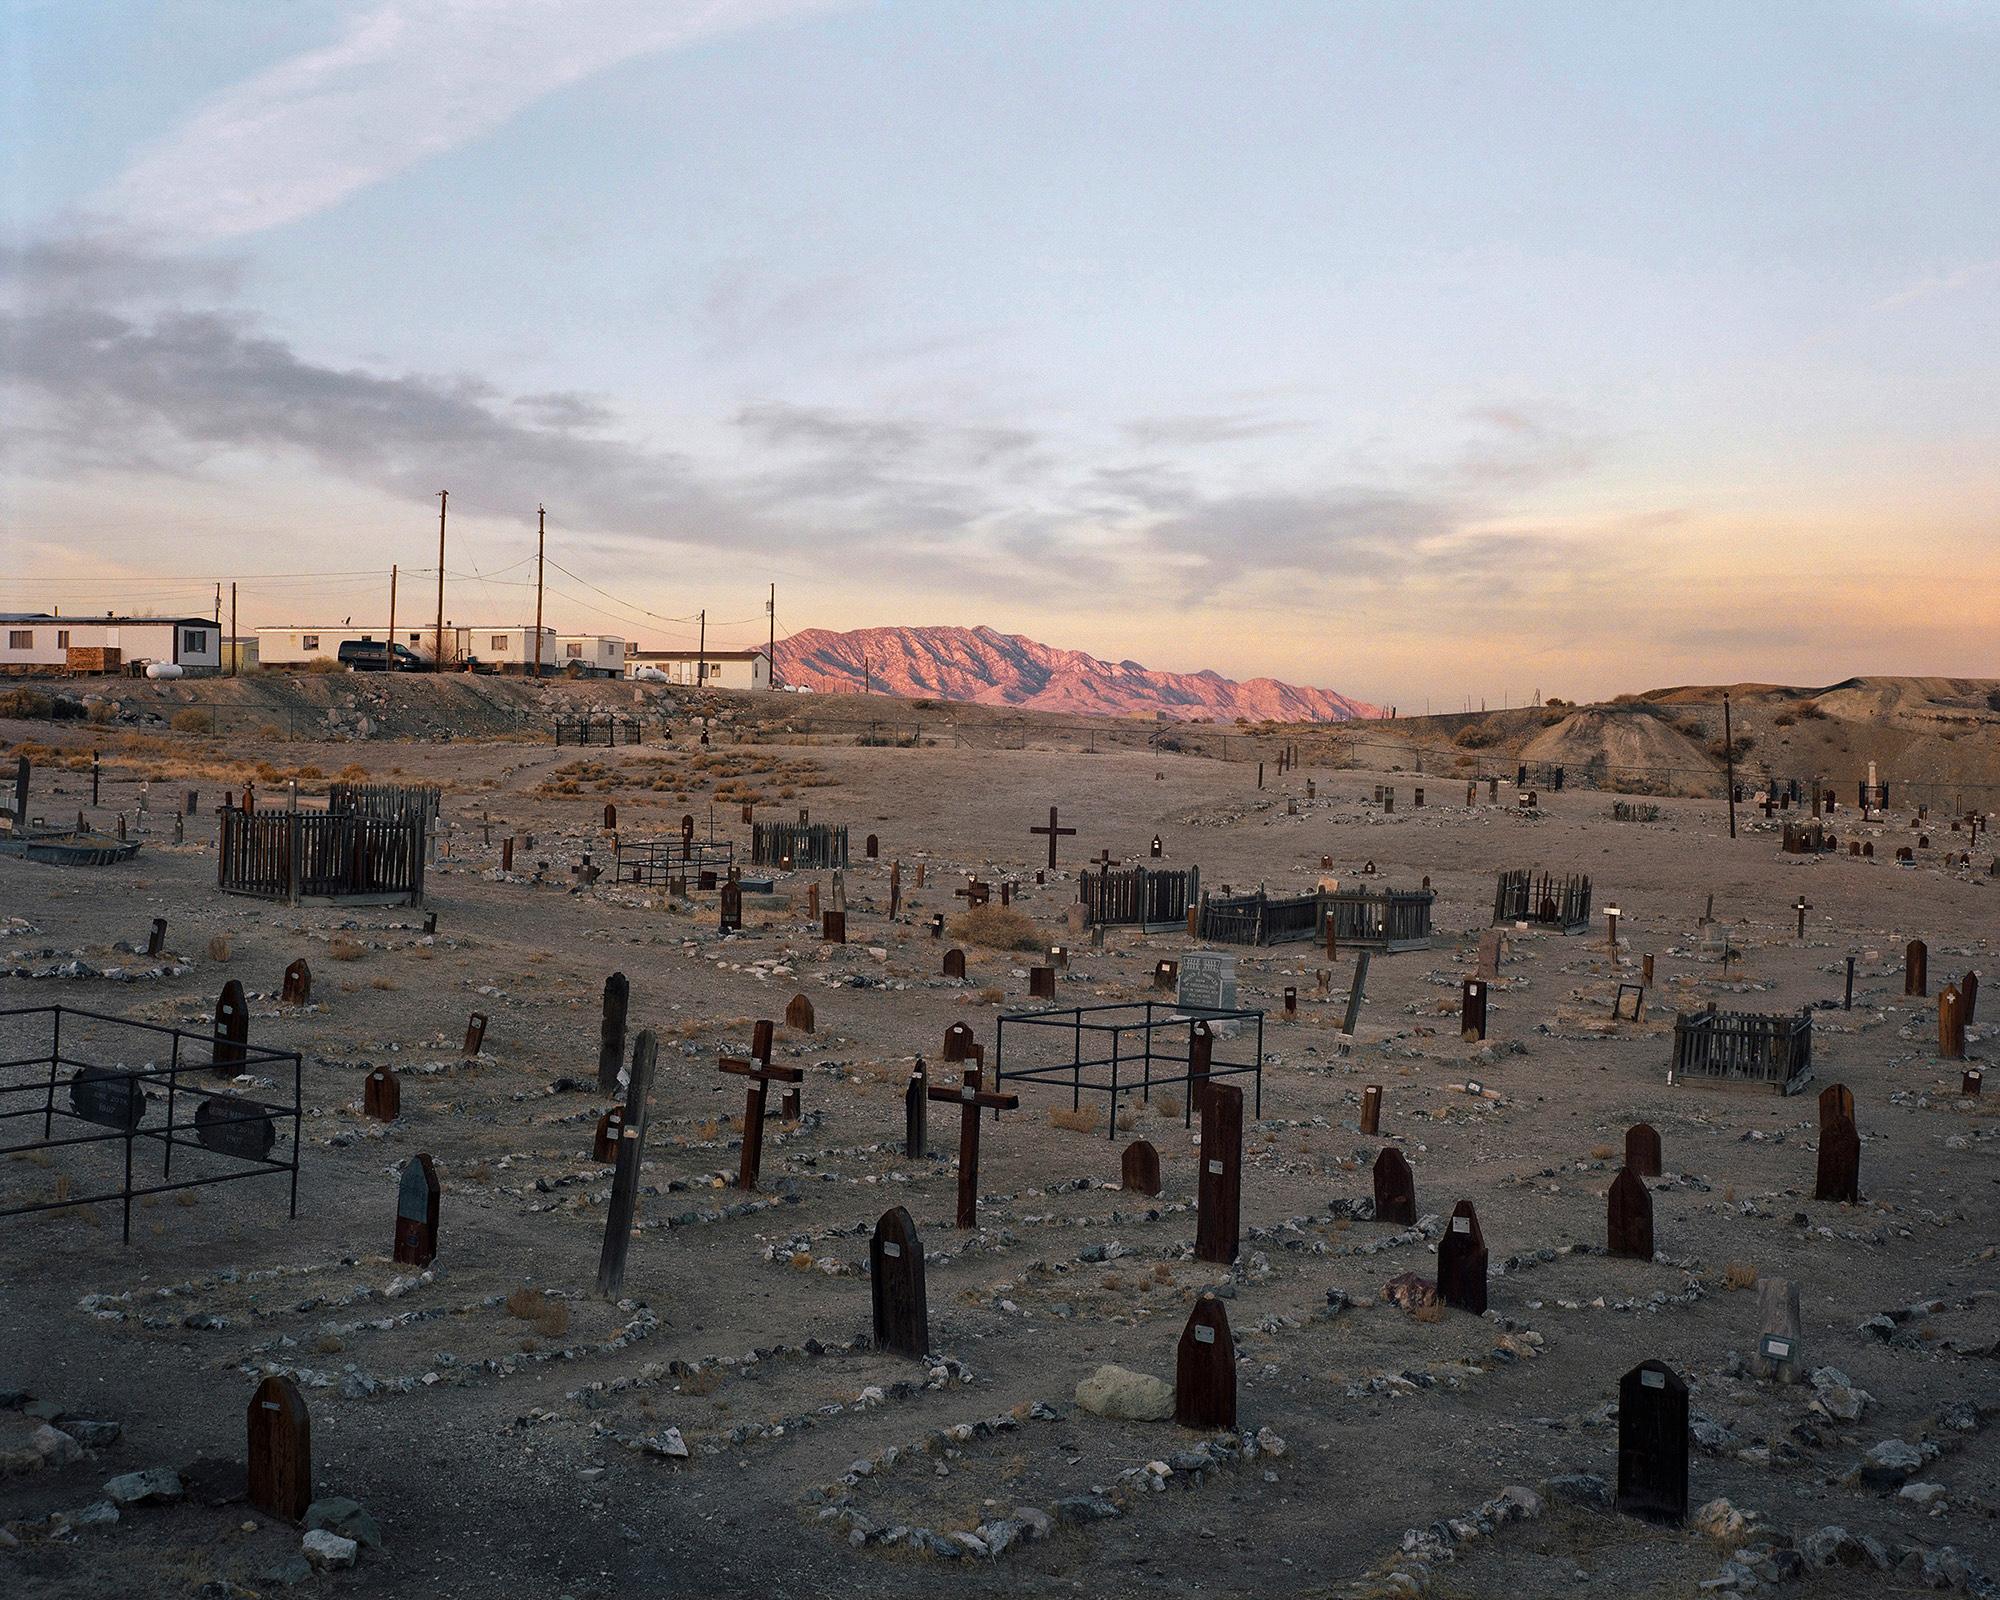 Bryan Schutmaat, Cemetery, Tonopah, Nevada, 2012